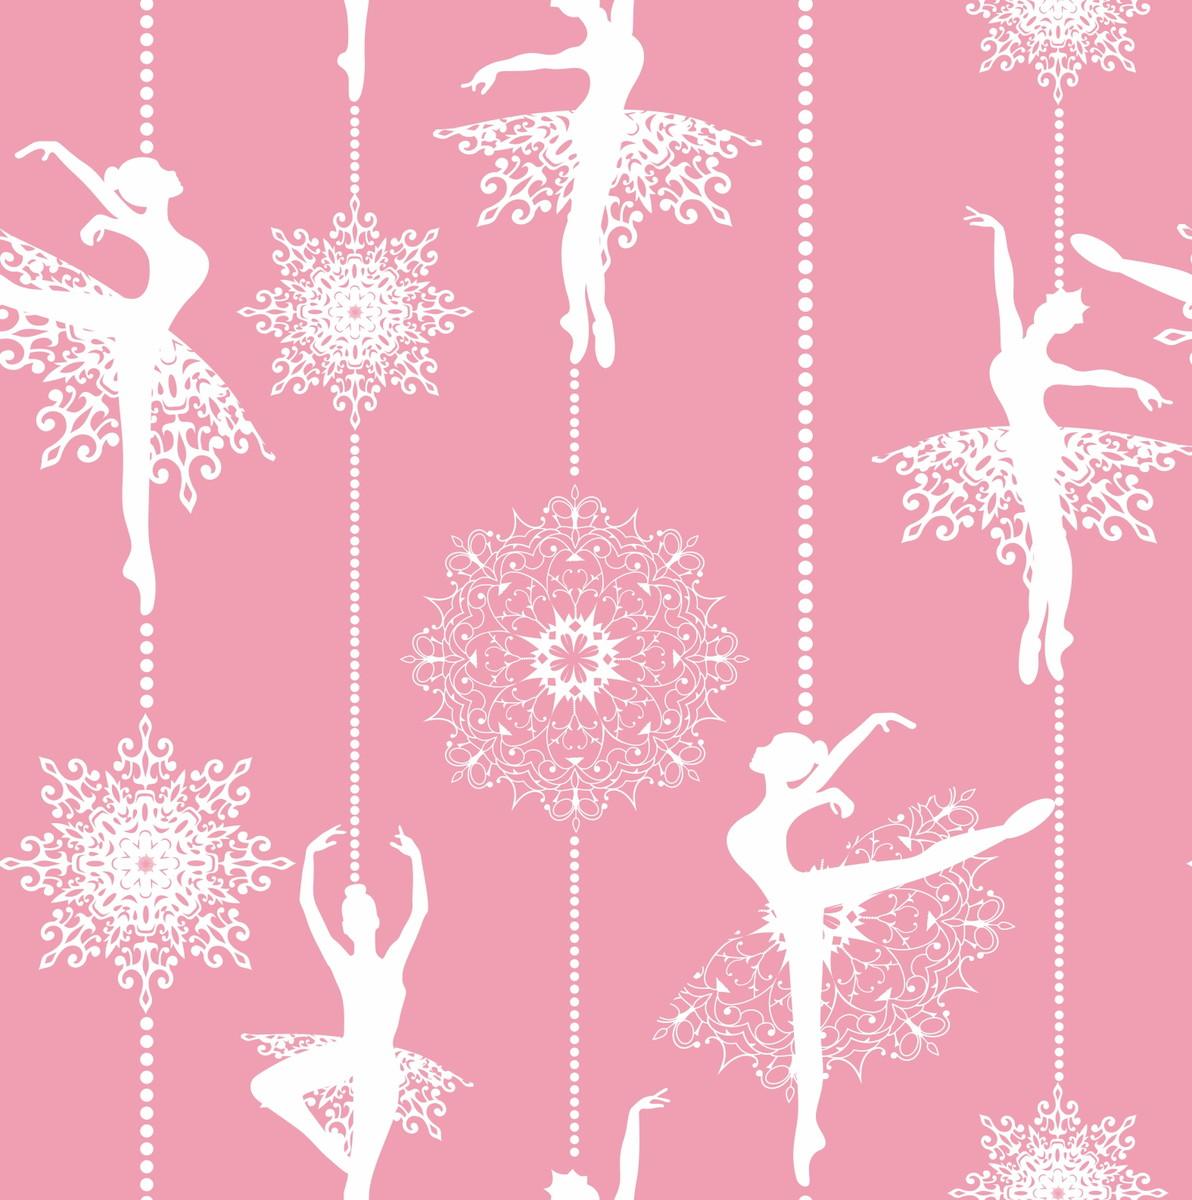 Papel de parede bailarina decor 02 no elo7 crie decore - Papel decorado para paredes ...